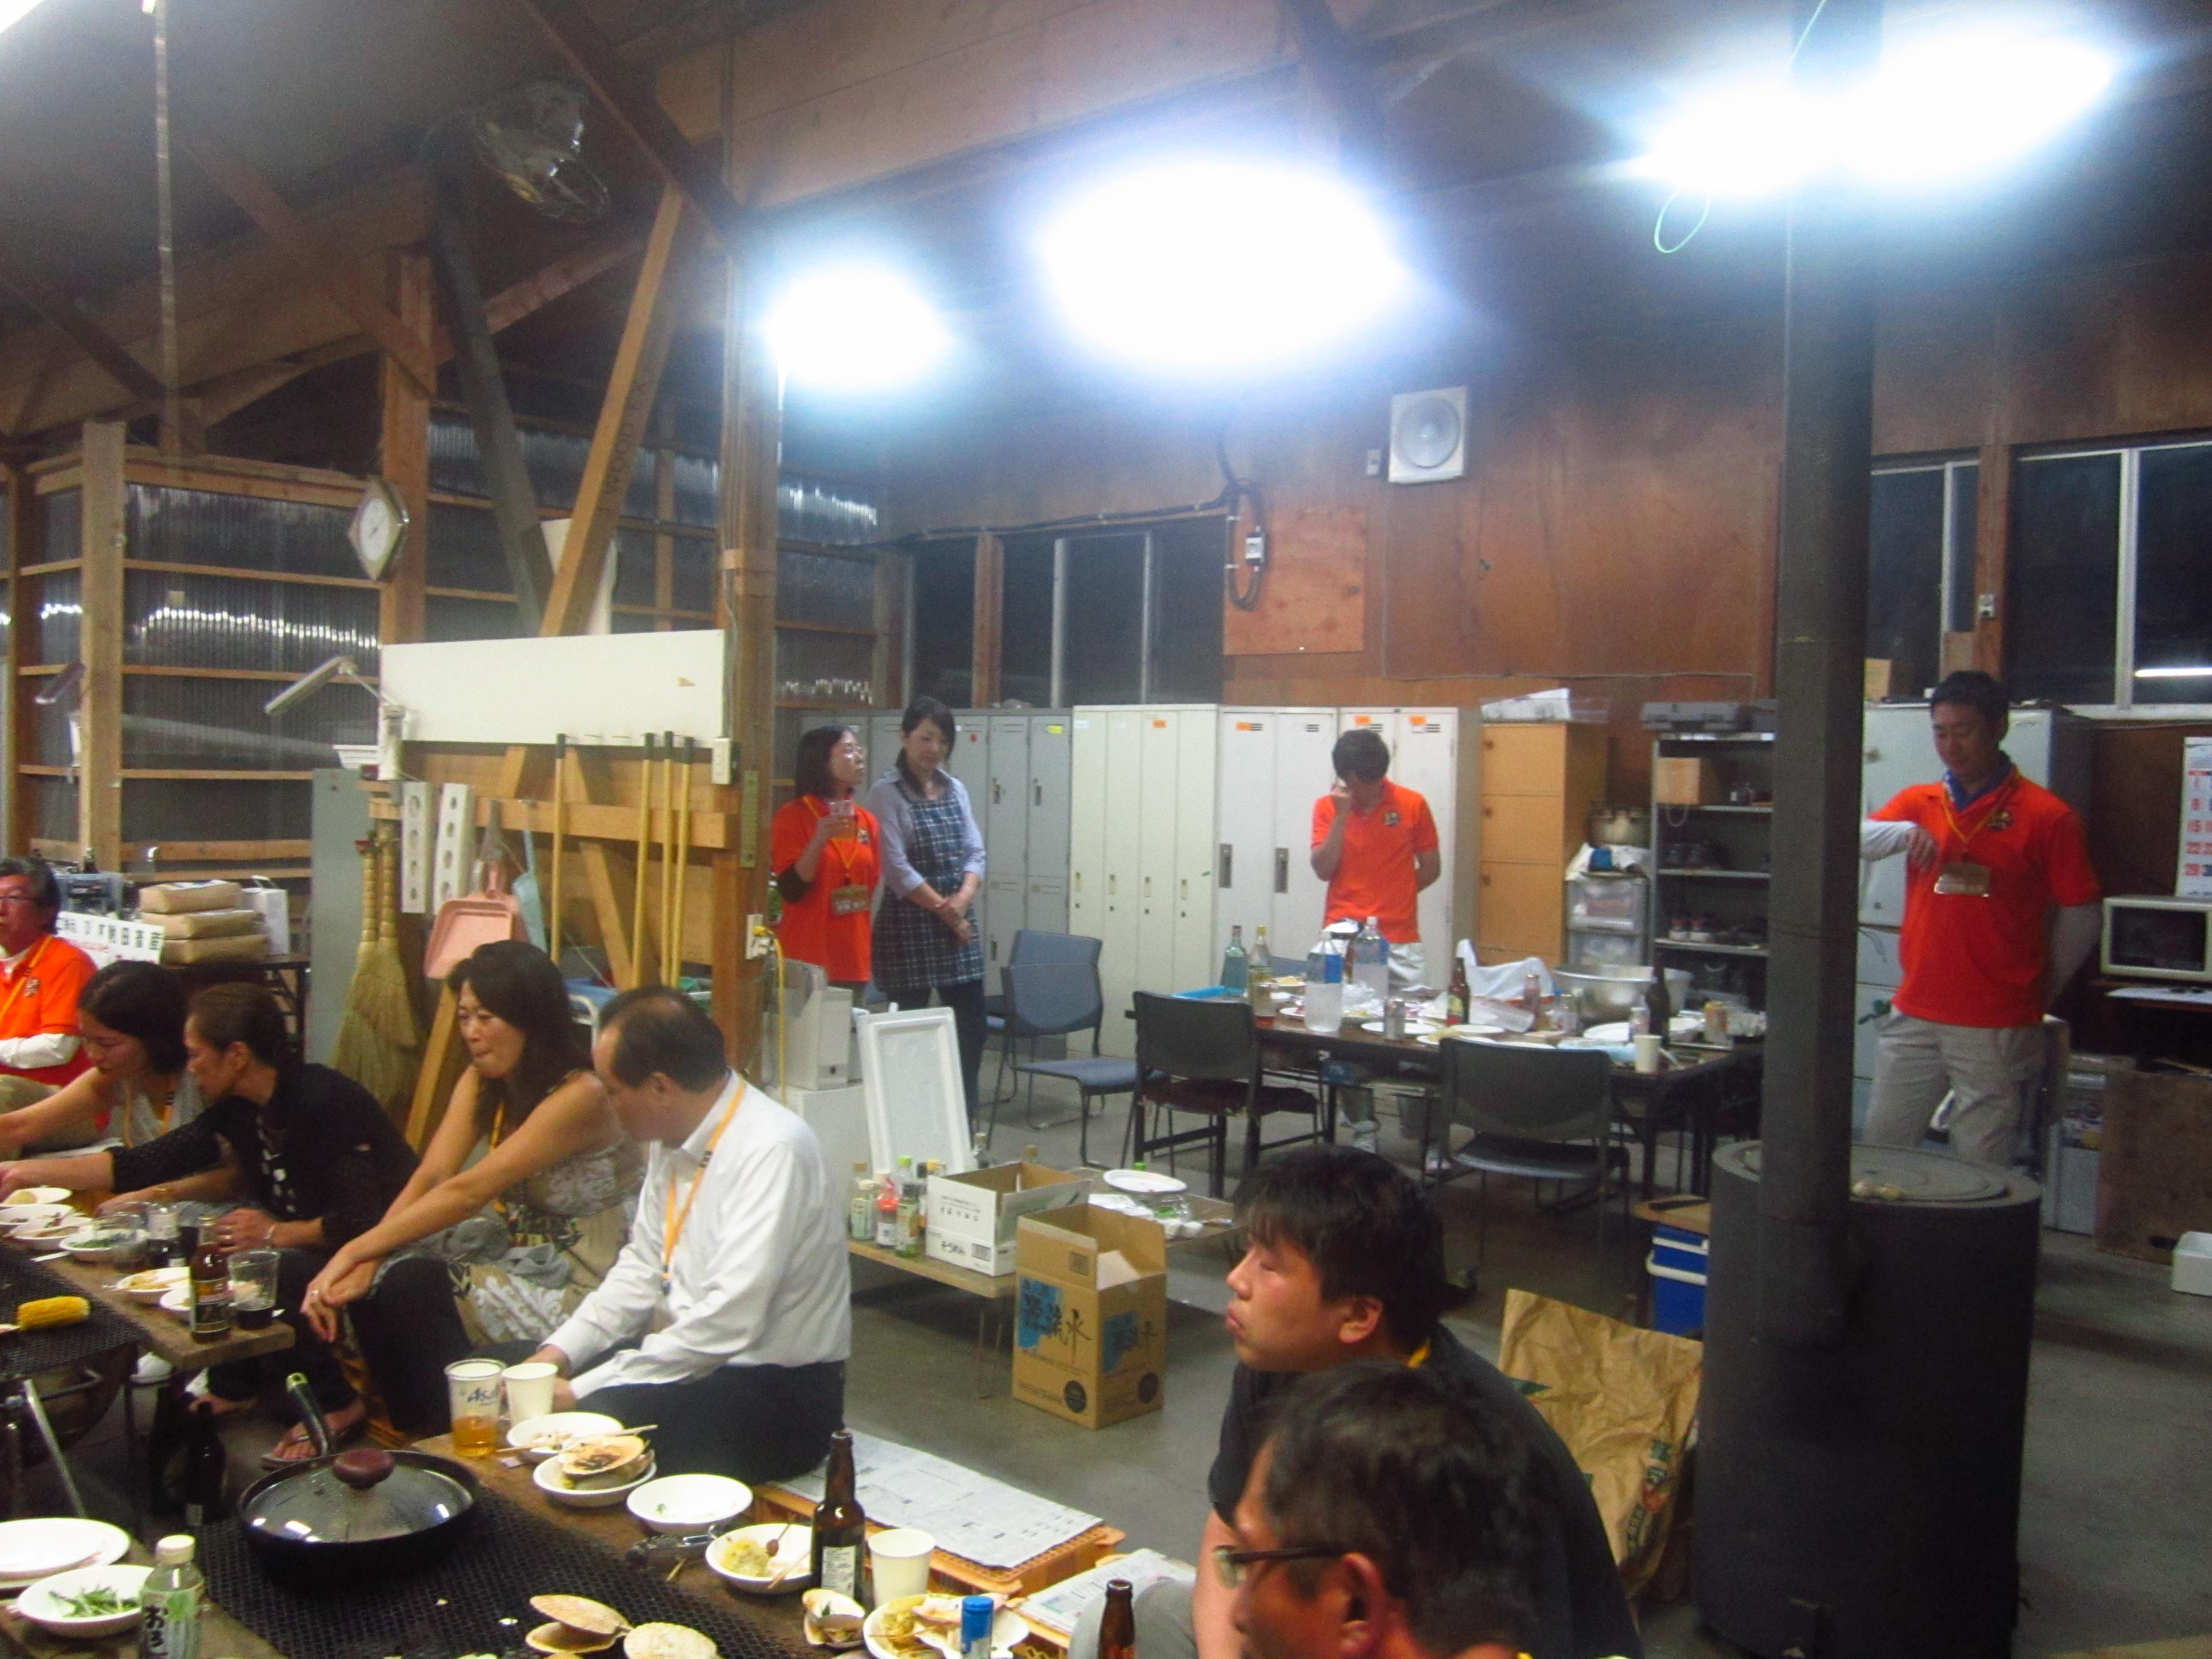 IMG 4302 - 麻布十番納涼祭り25,26日(七戸町出店)